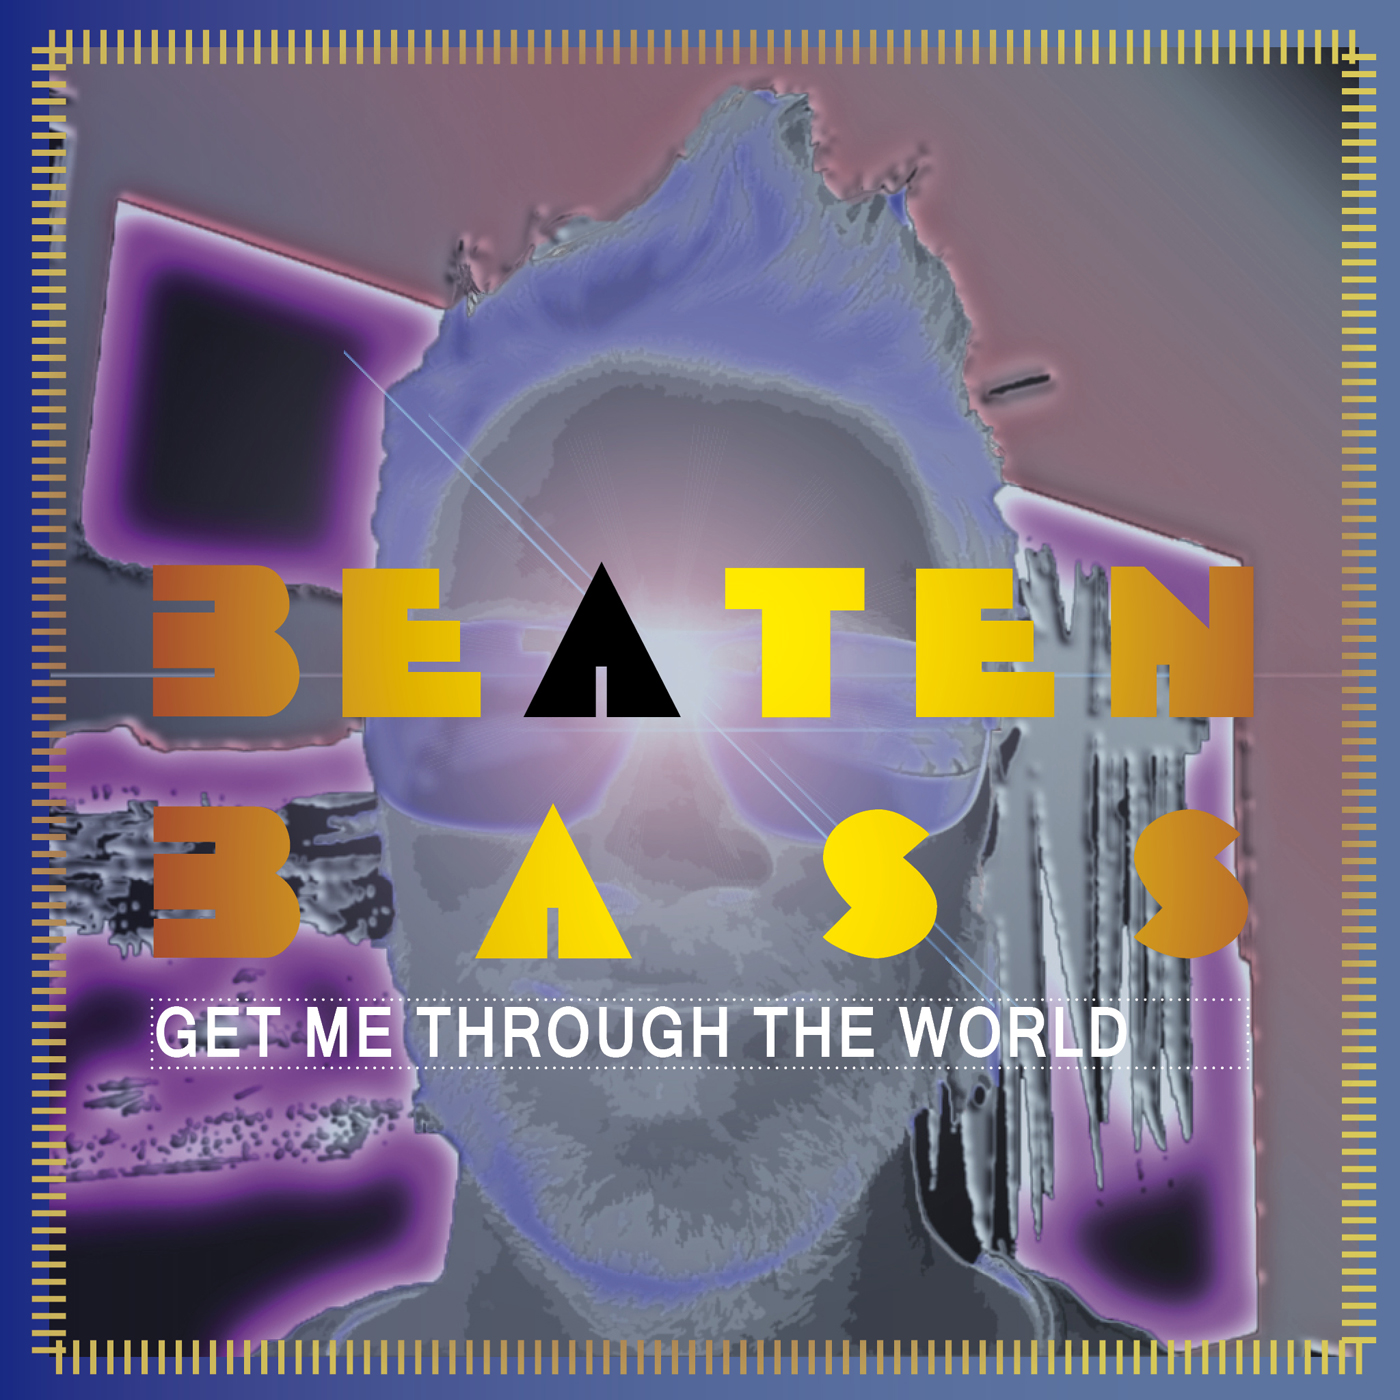 Get-Me-Through-The-World_1400